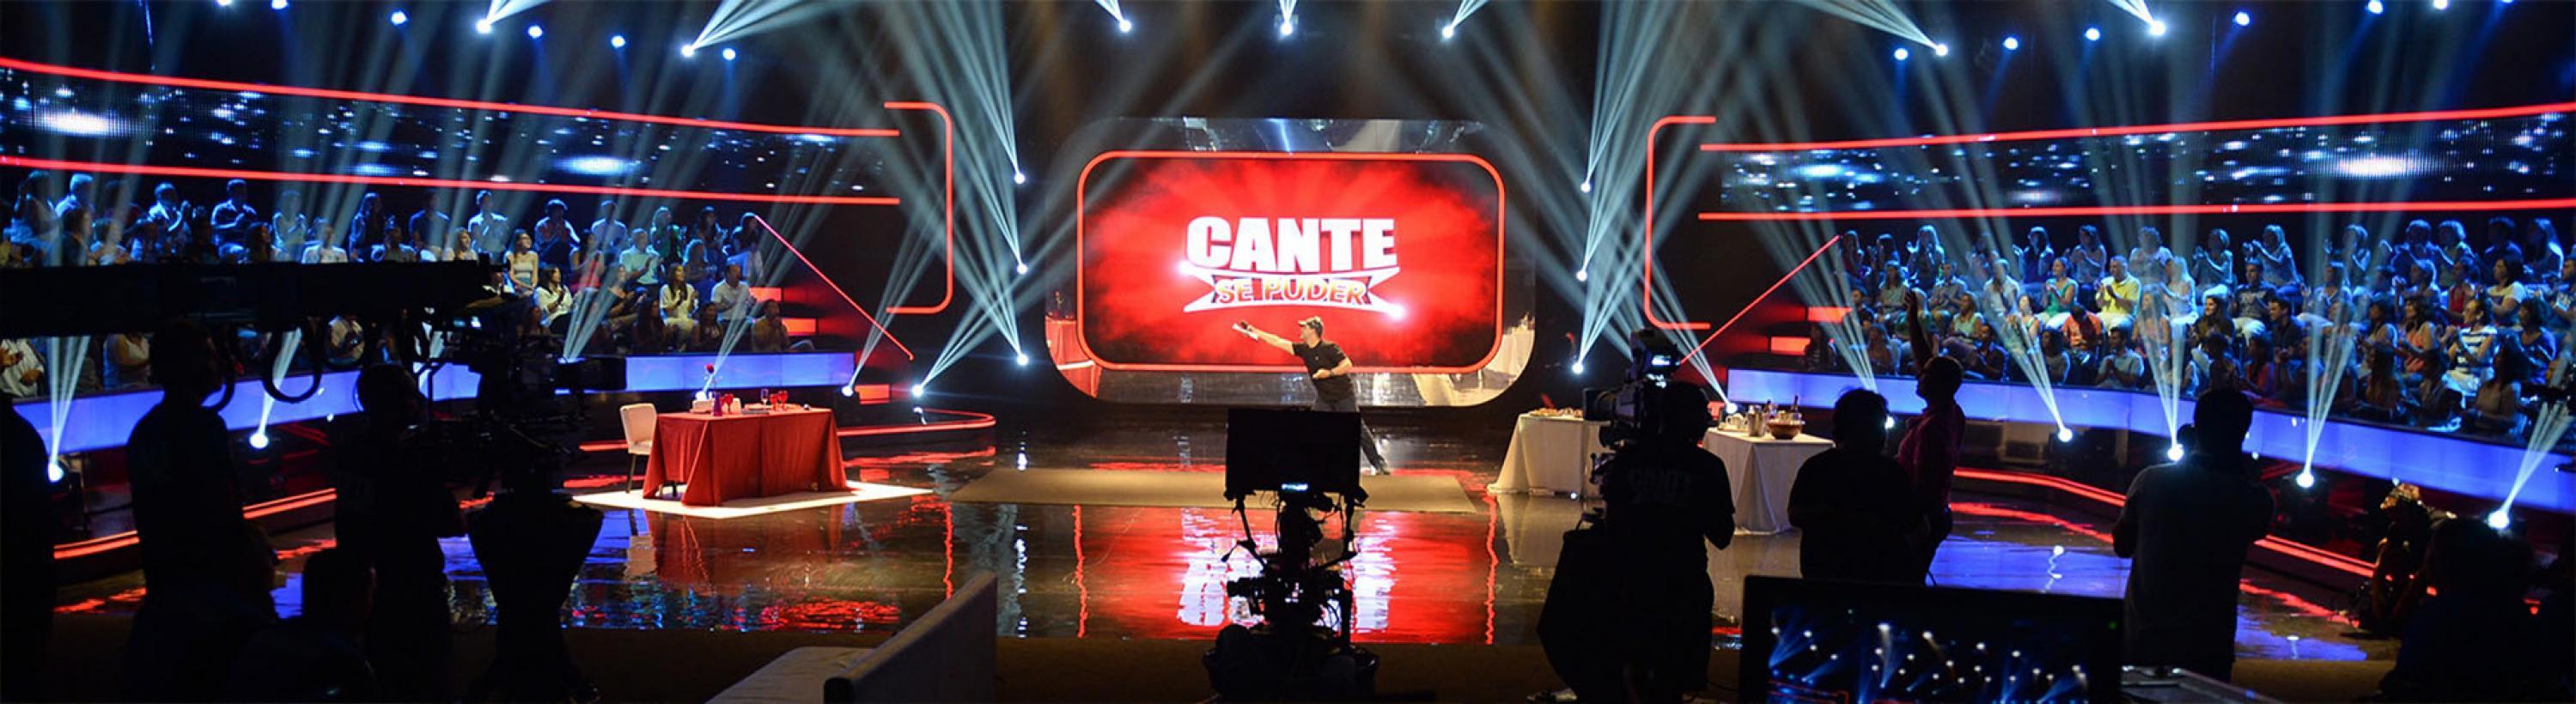 CANTE SE PUDER